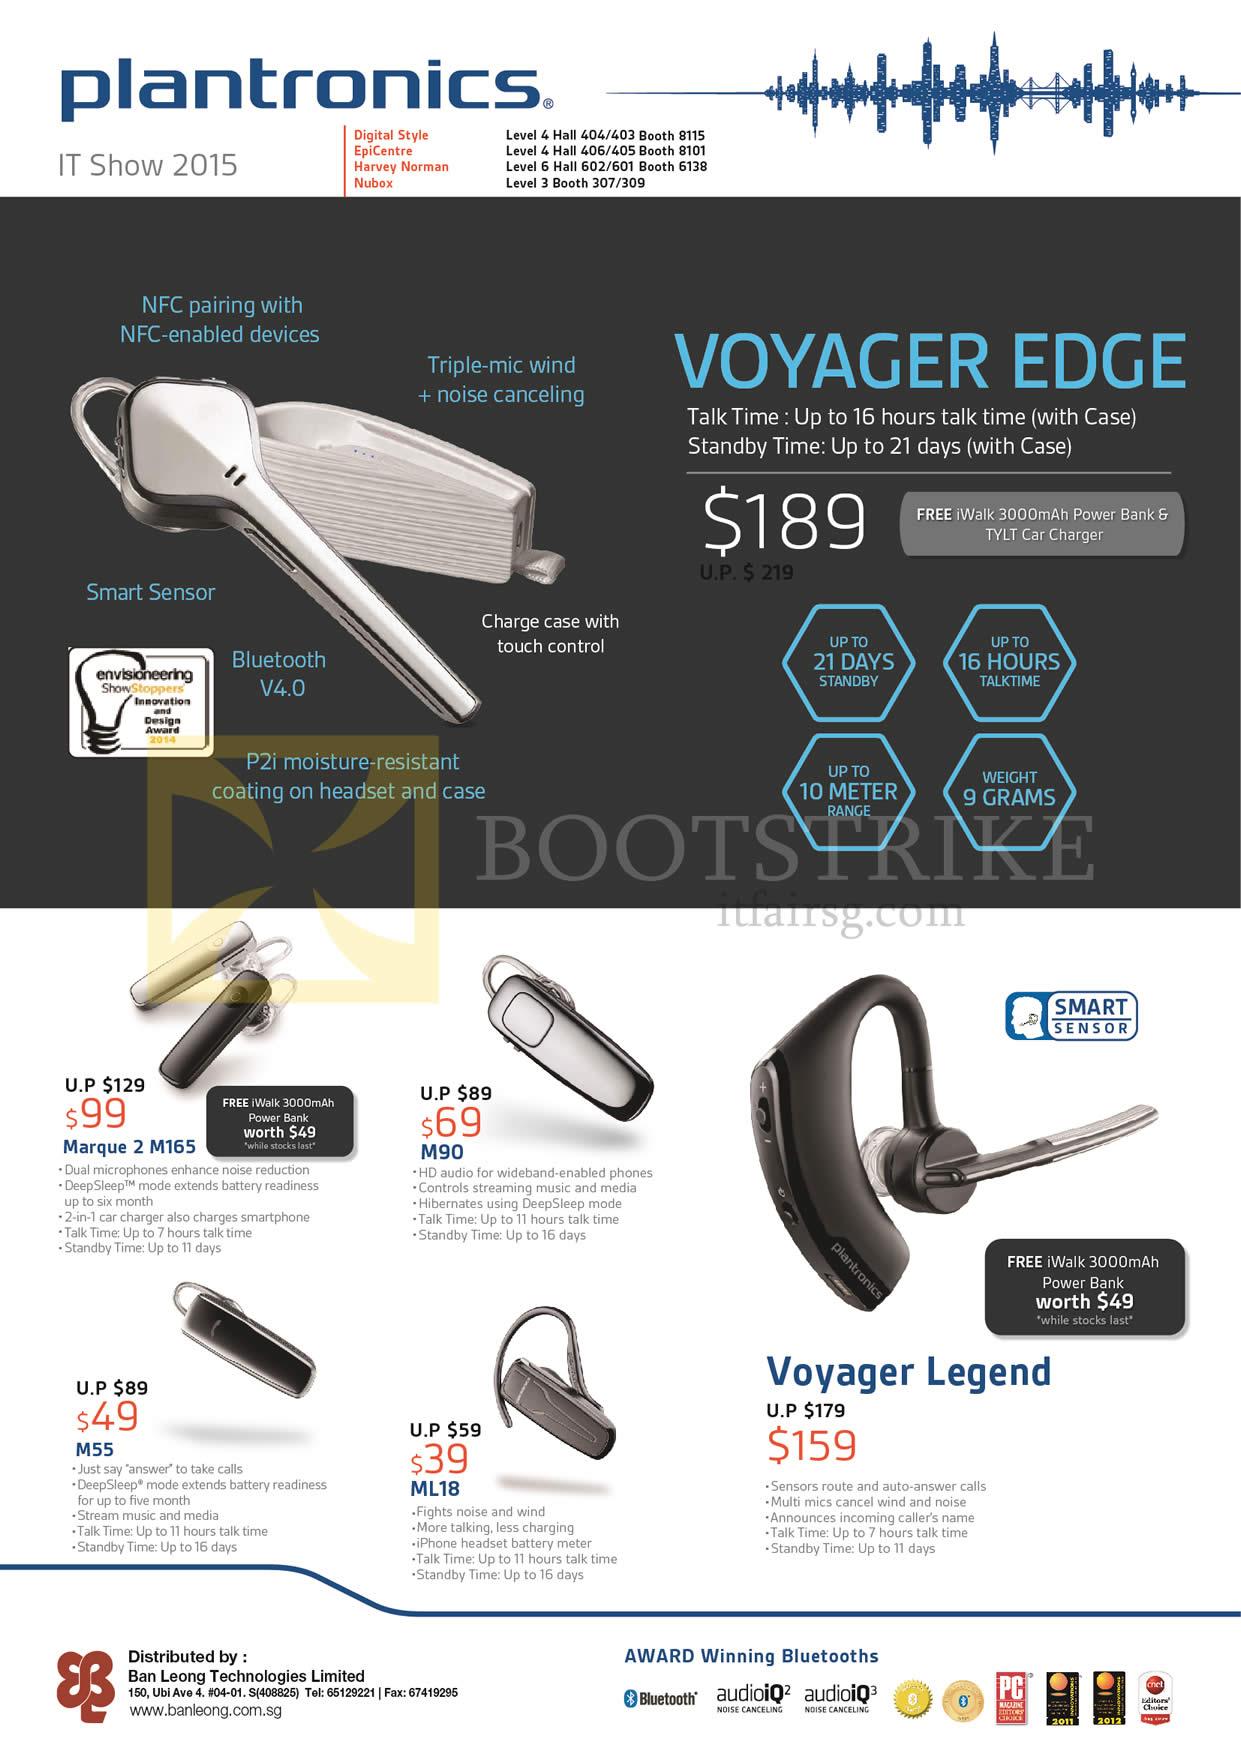 Plantronics Bluetooth Headsets Voyager Edge, Marque 2 M165